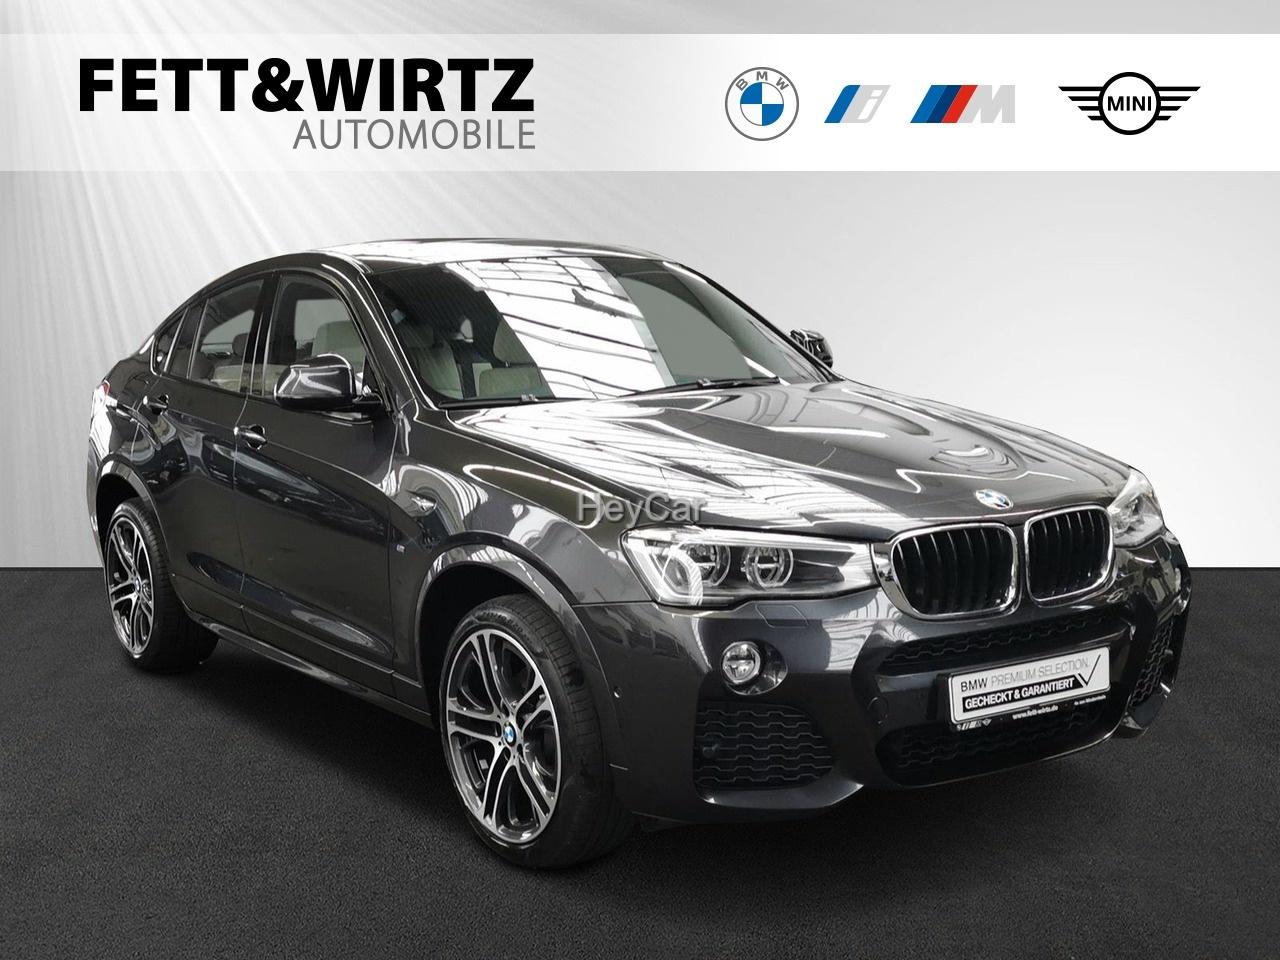 BMW X4 xDrive20d M Sport NaviProf. AHK HUD GSD HiFi, Jahr 2017, Diesel